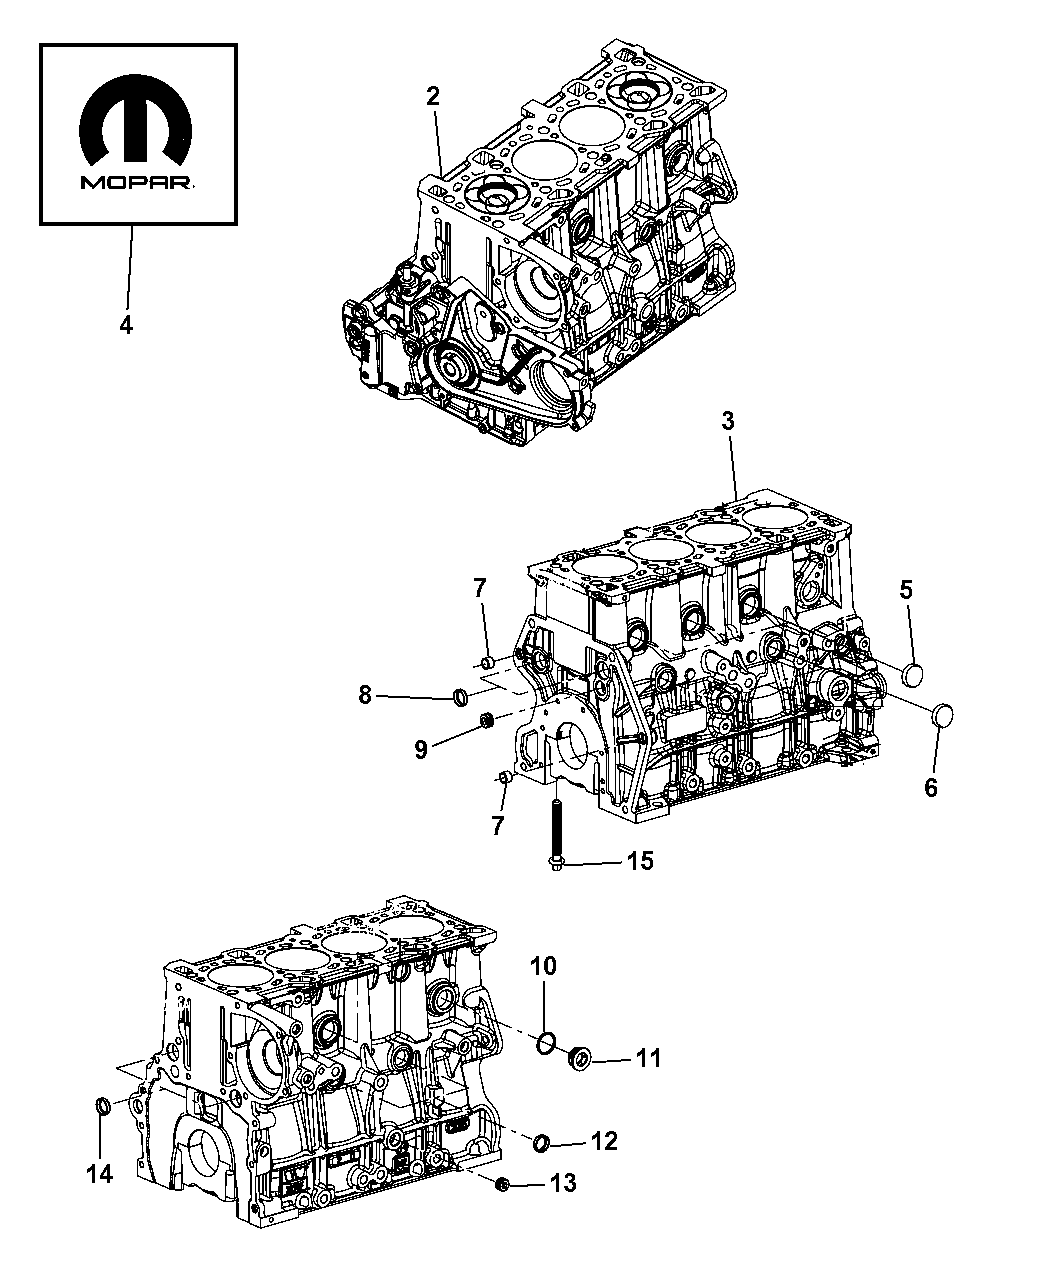 2008 Jeep Liberty Engine Cylinder Block & Hardware